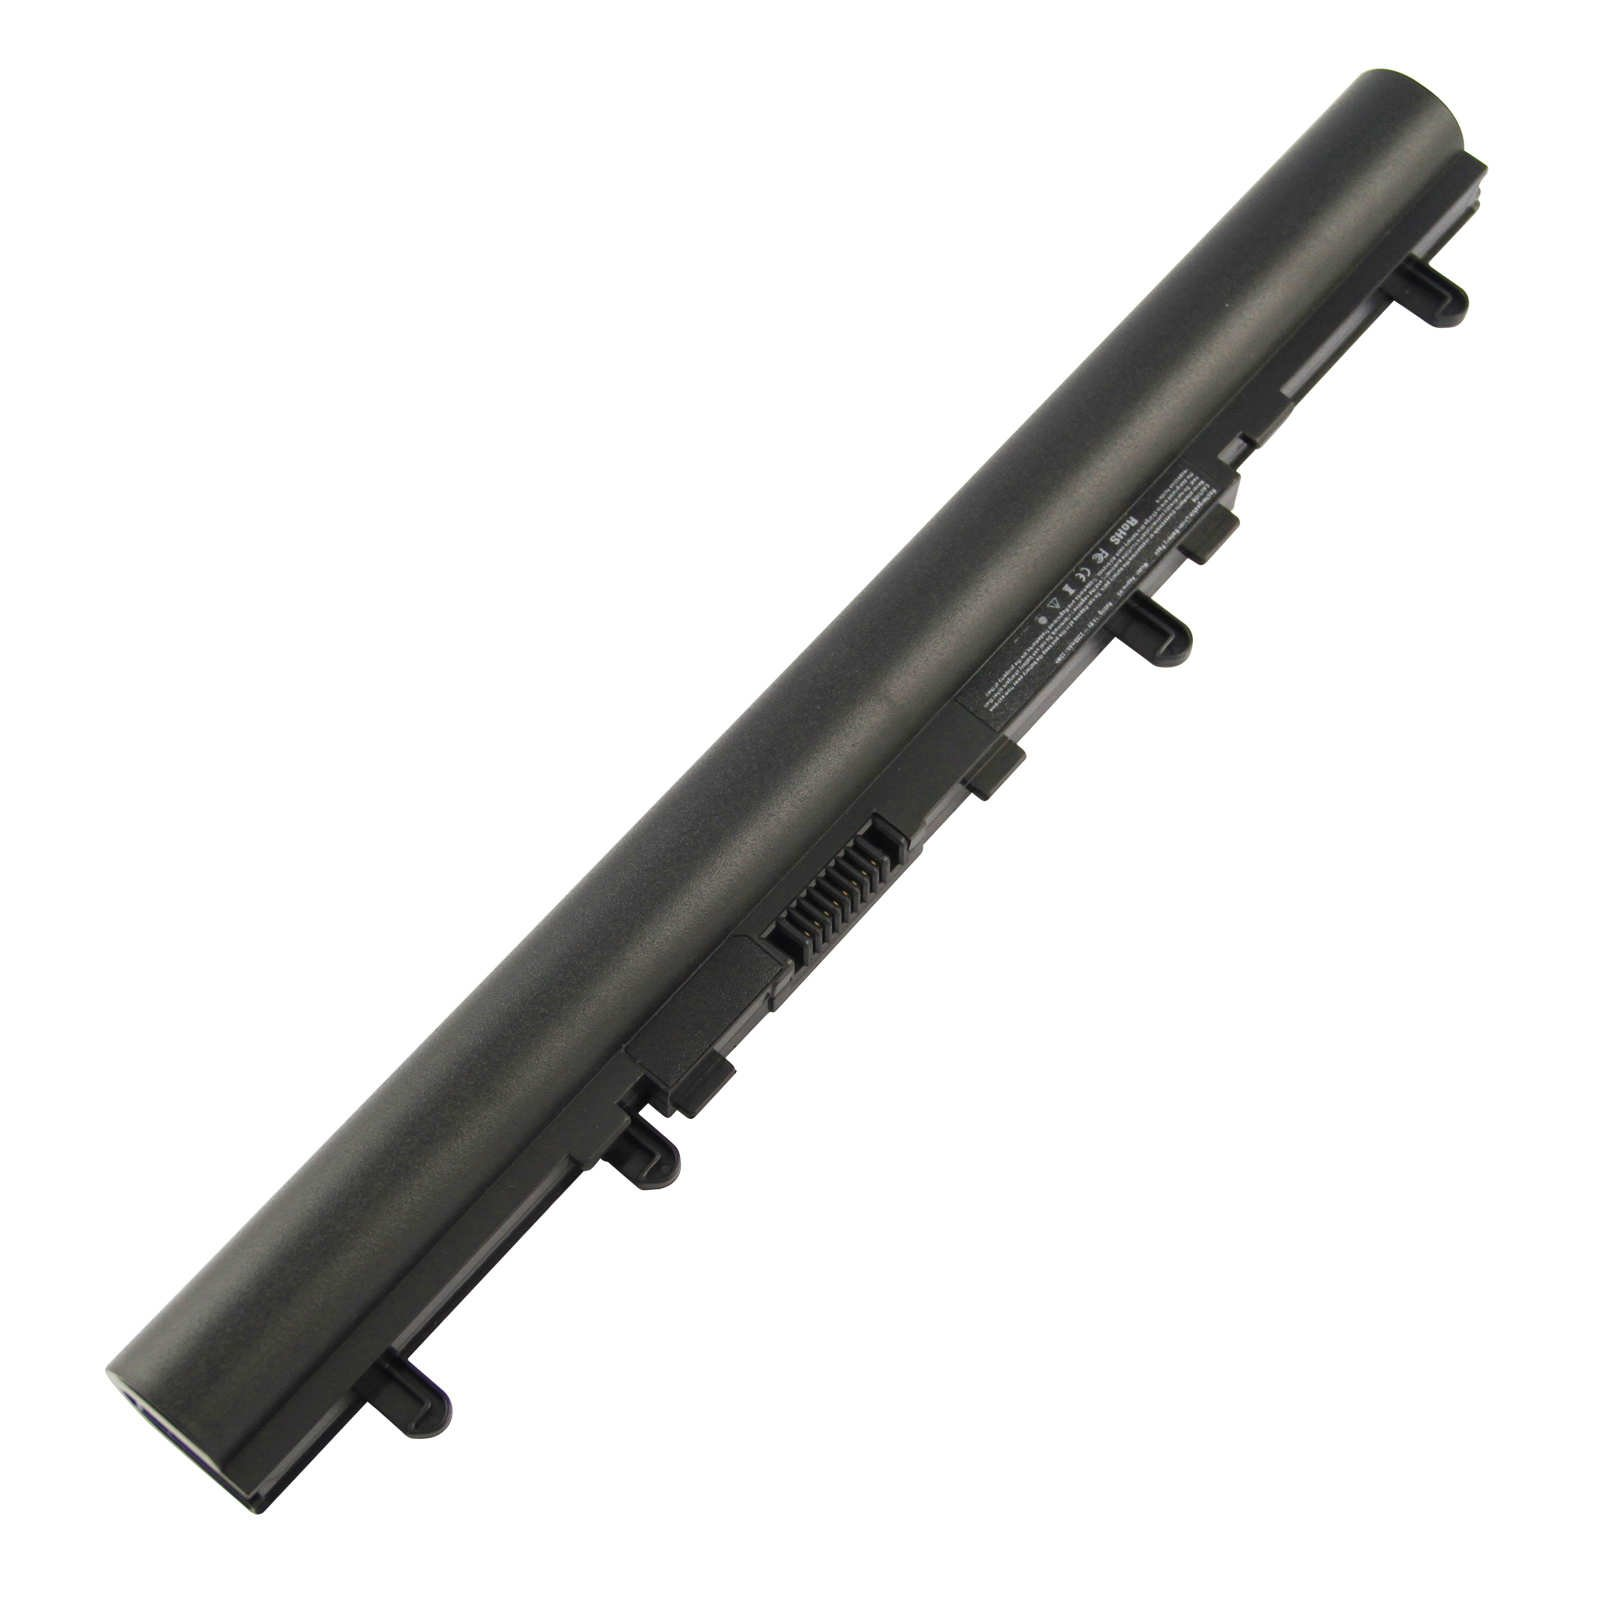 Bateria Para Acer Aspire V5-431 V5-471 V5-531p V5-551 V5-571 4icr17/65 Al12a32 2200mah